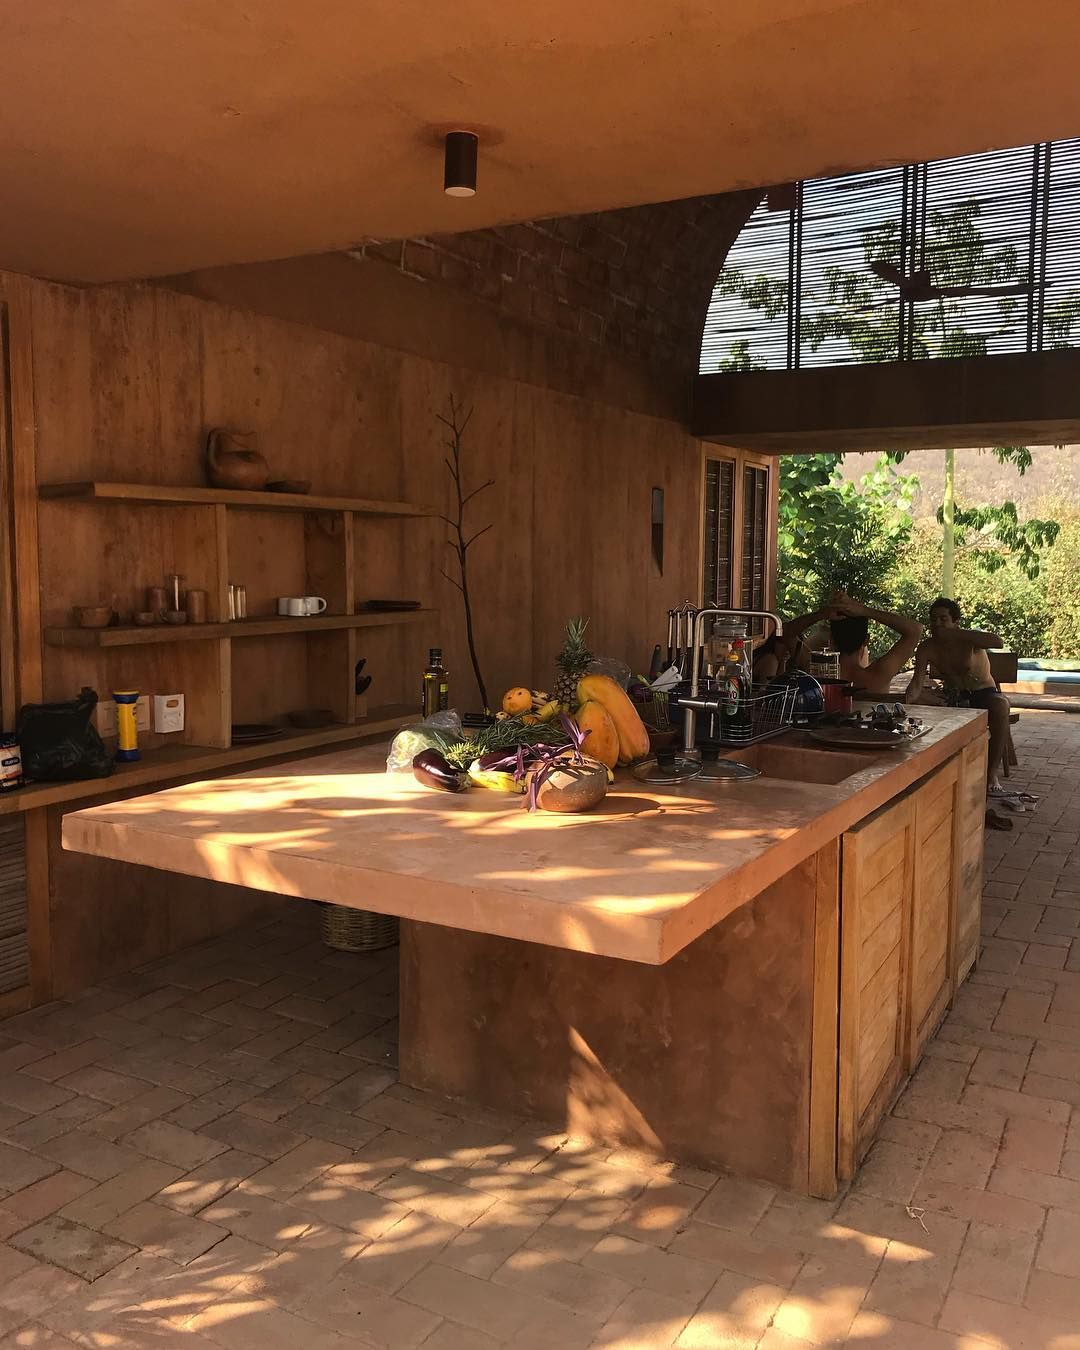 Rebecca Bartoshesky Bartoshesky Instagram Photos And Videos Country Style Kitchen Fresh House House Interior